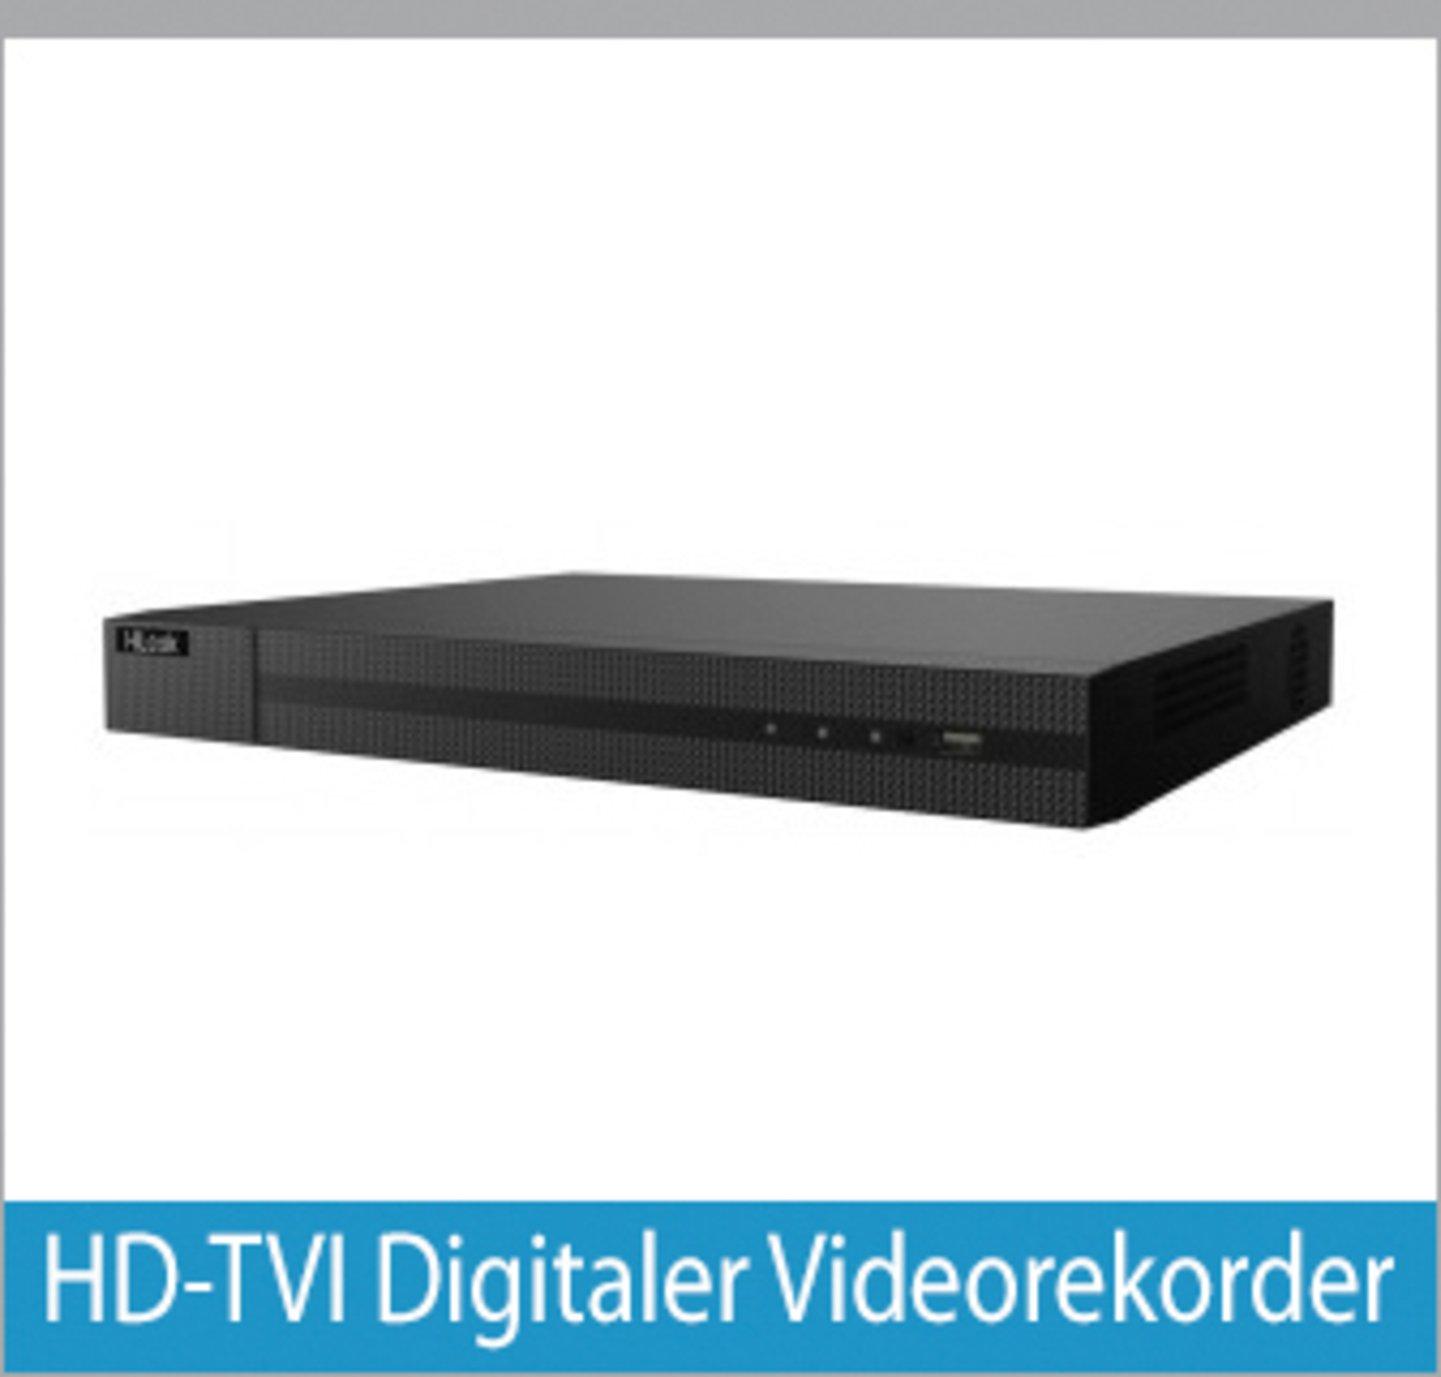 HD-TVI Digitaler Videorekorder